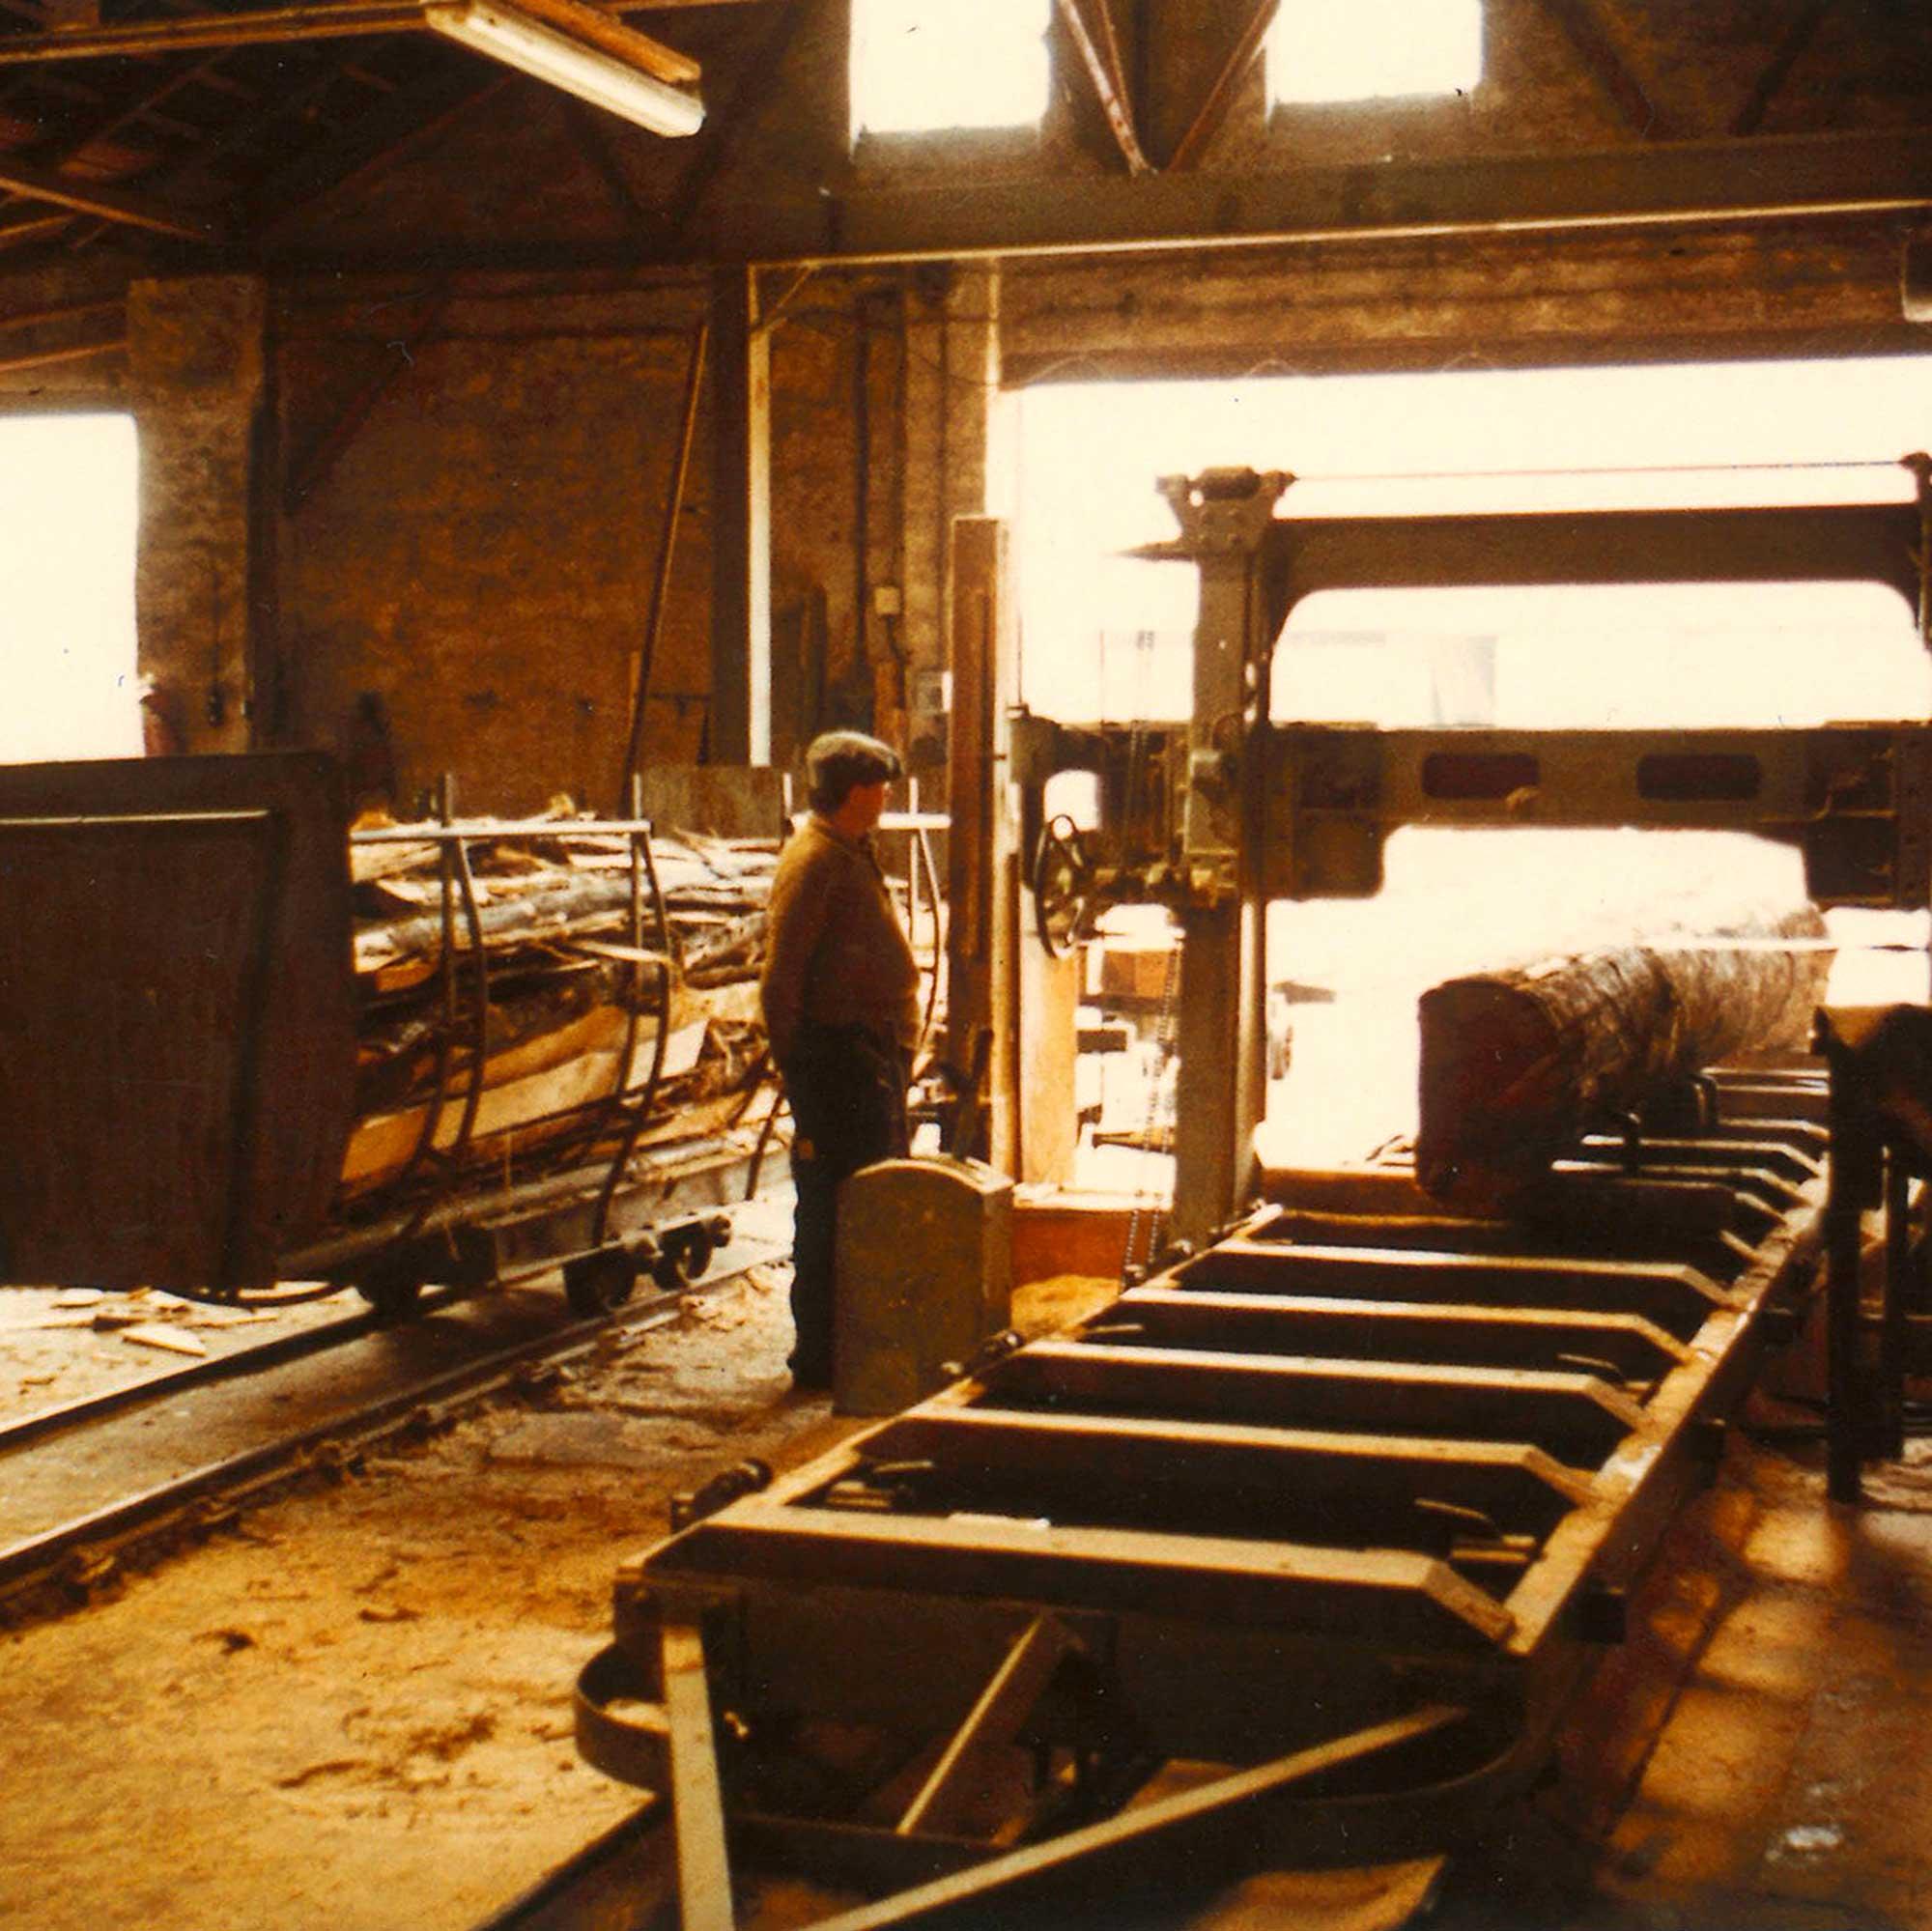 Mann im Sägewerk bei HolzLand Verbeek